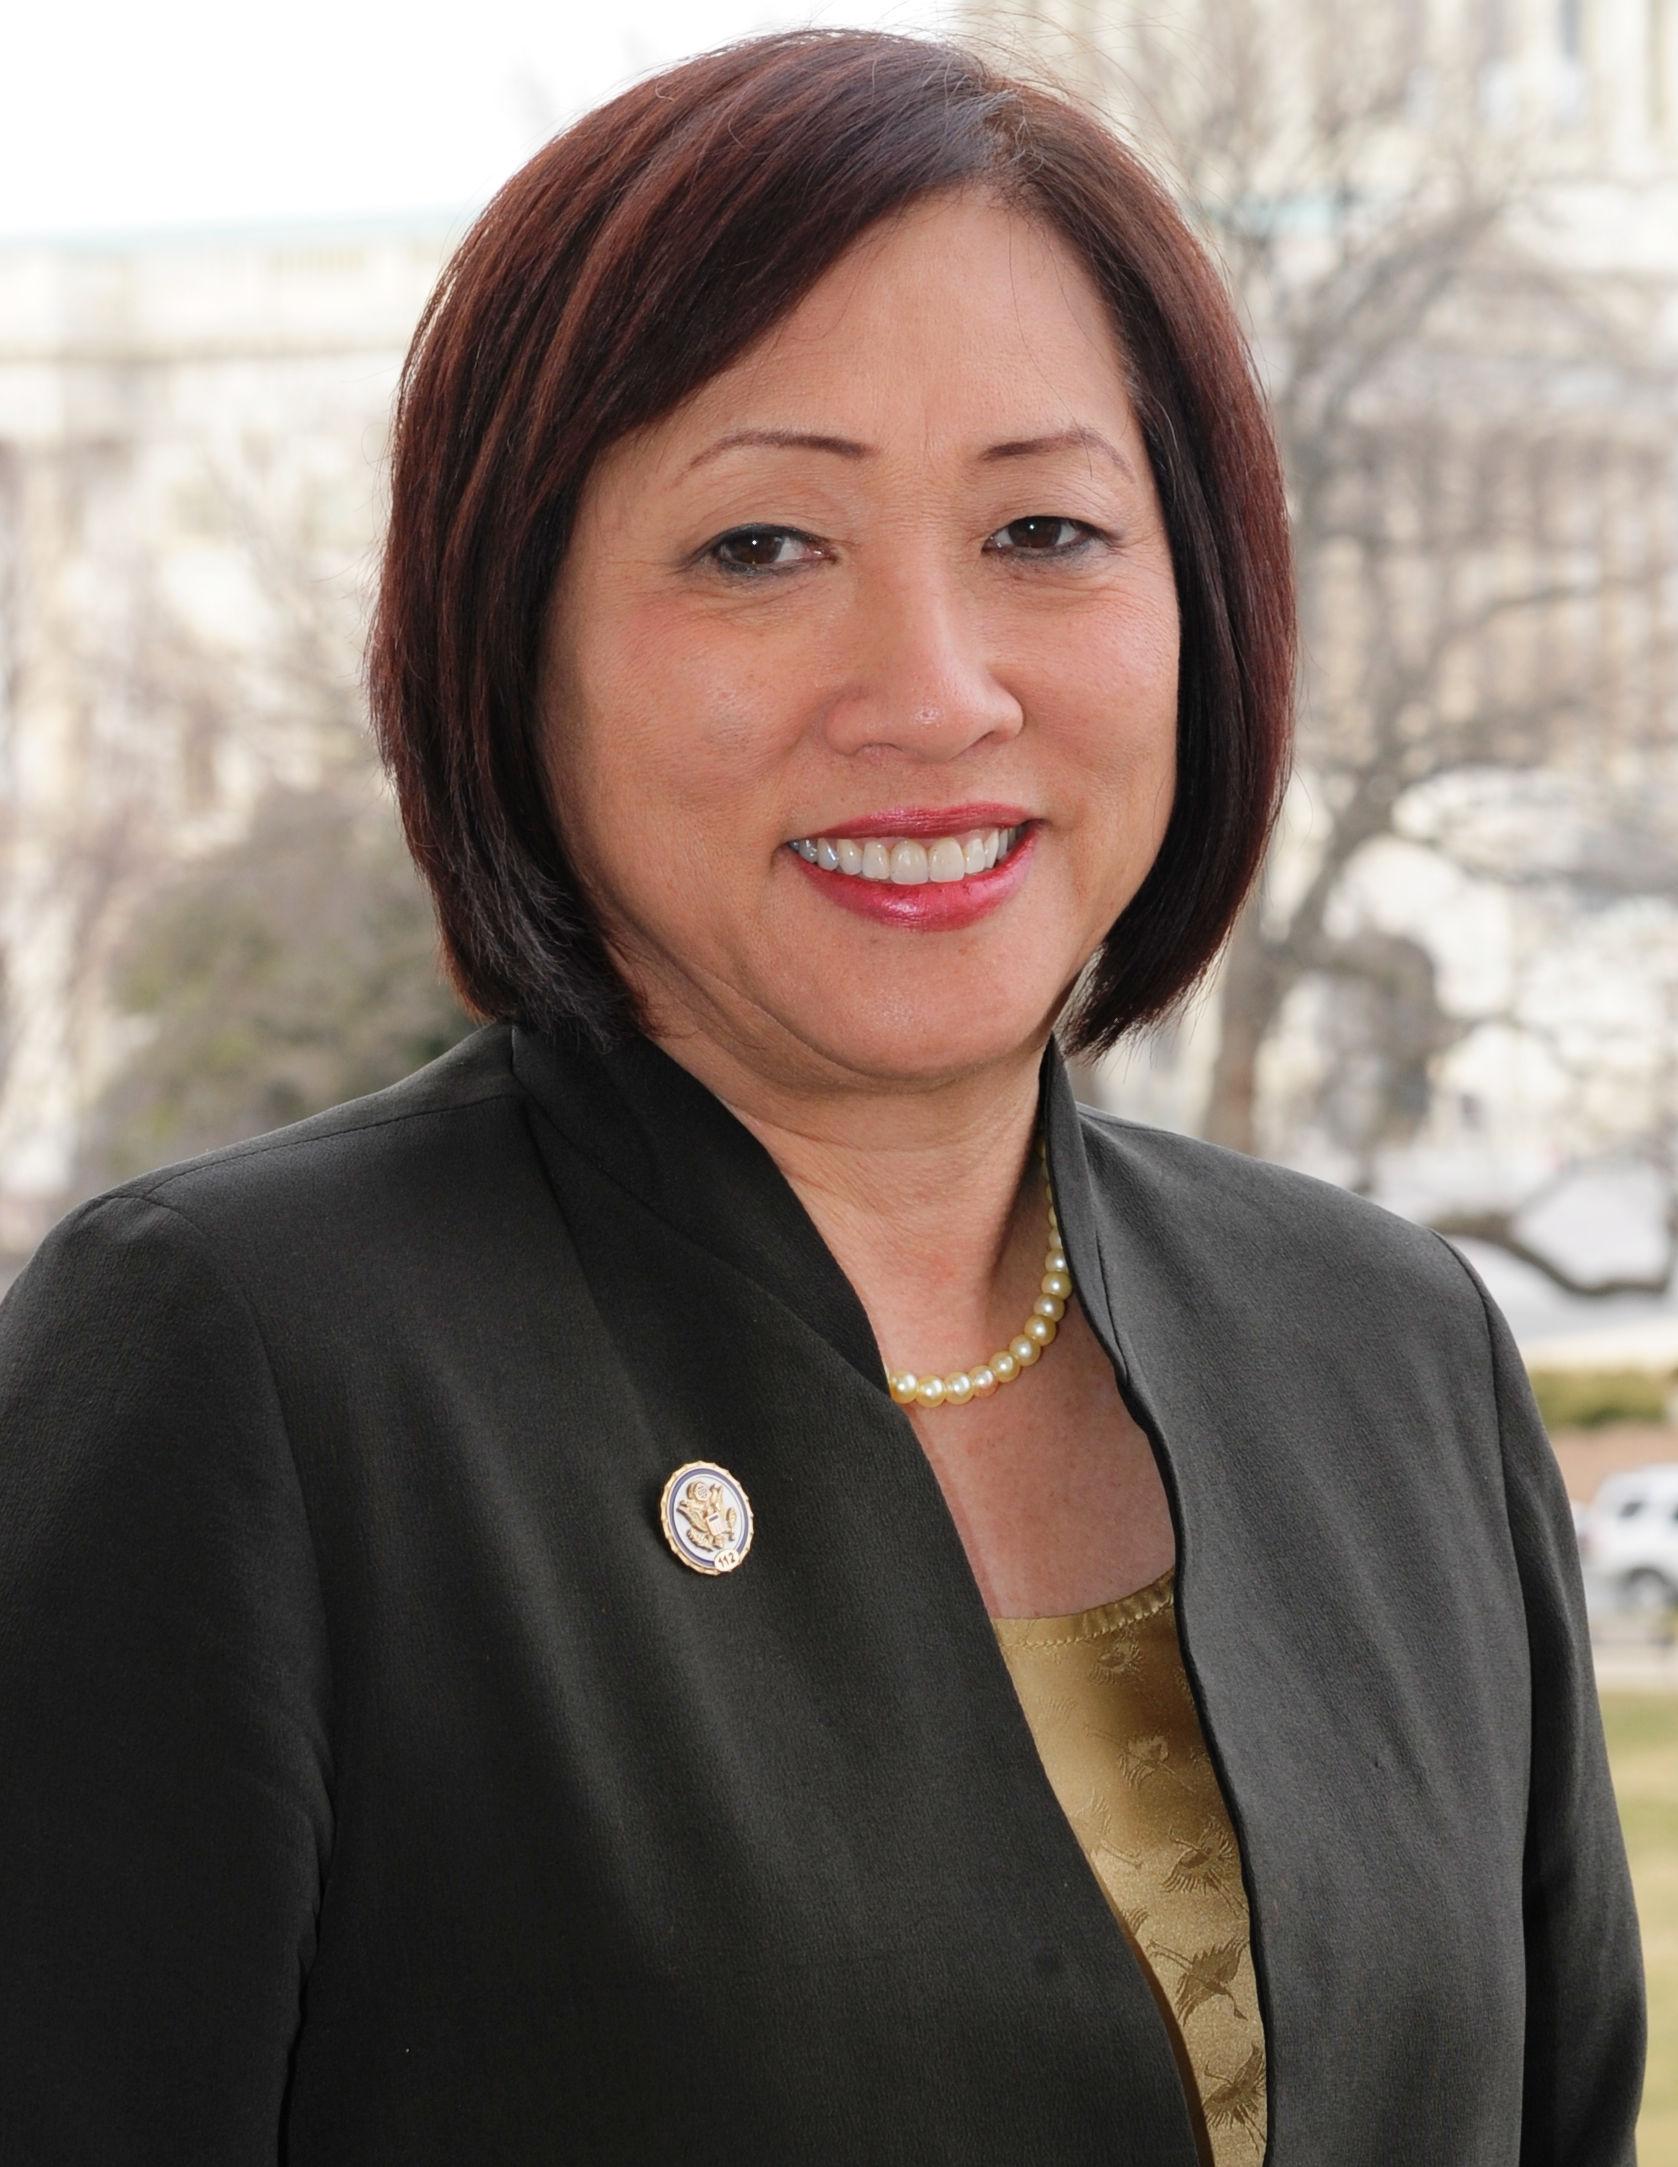 Photo of Colleen Hanabusa: American politician